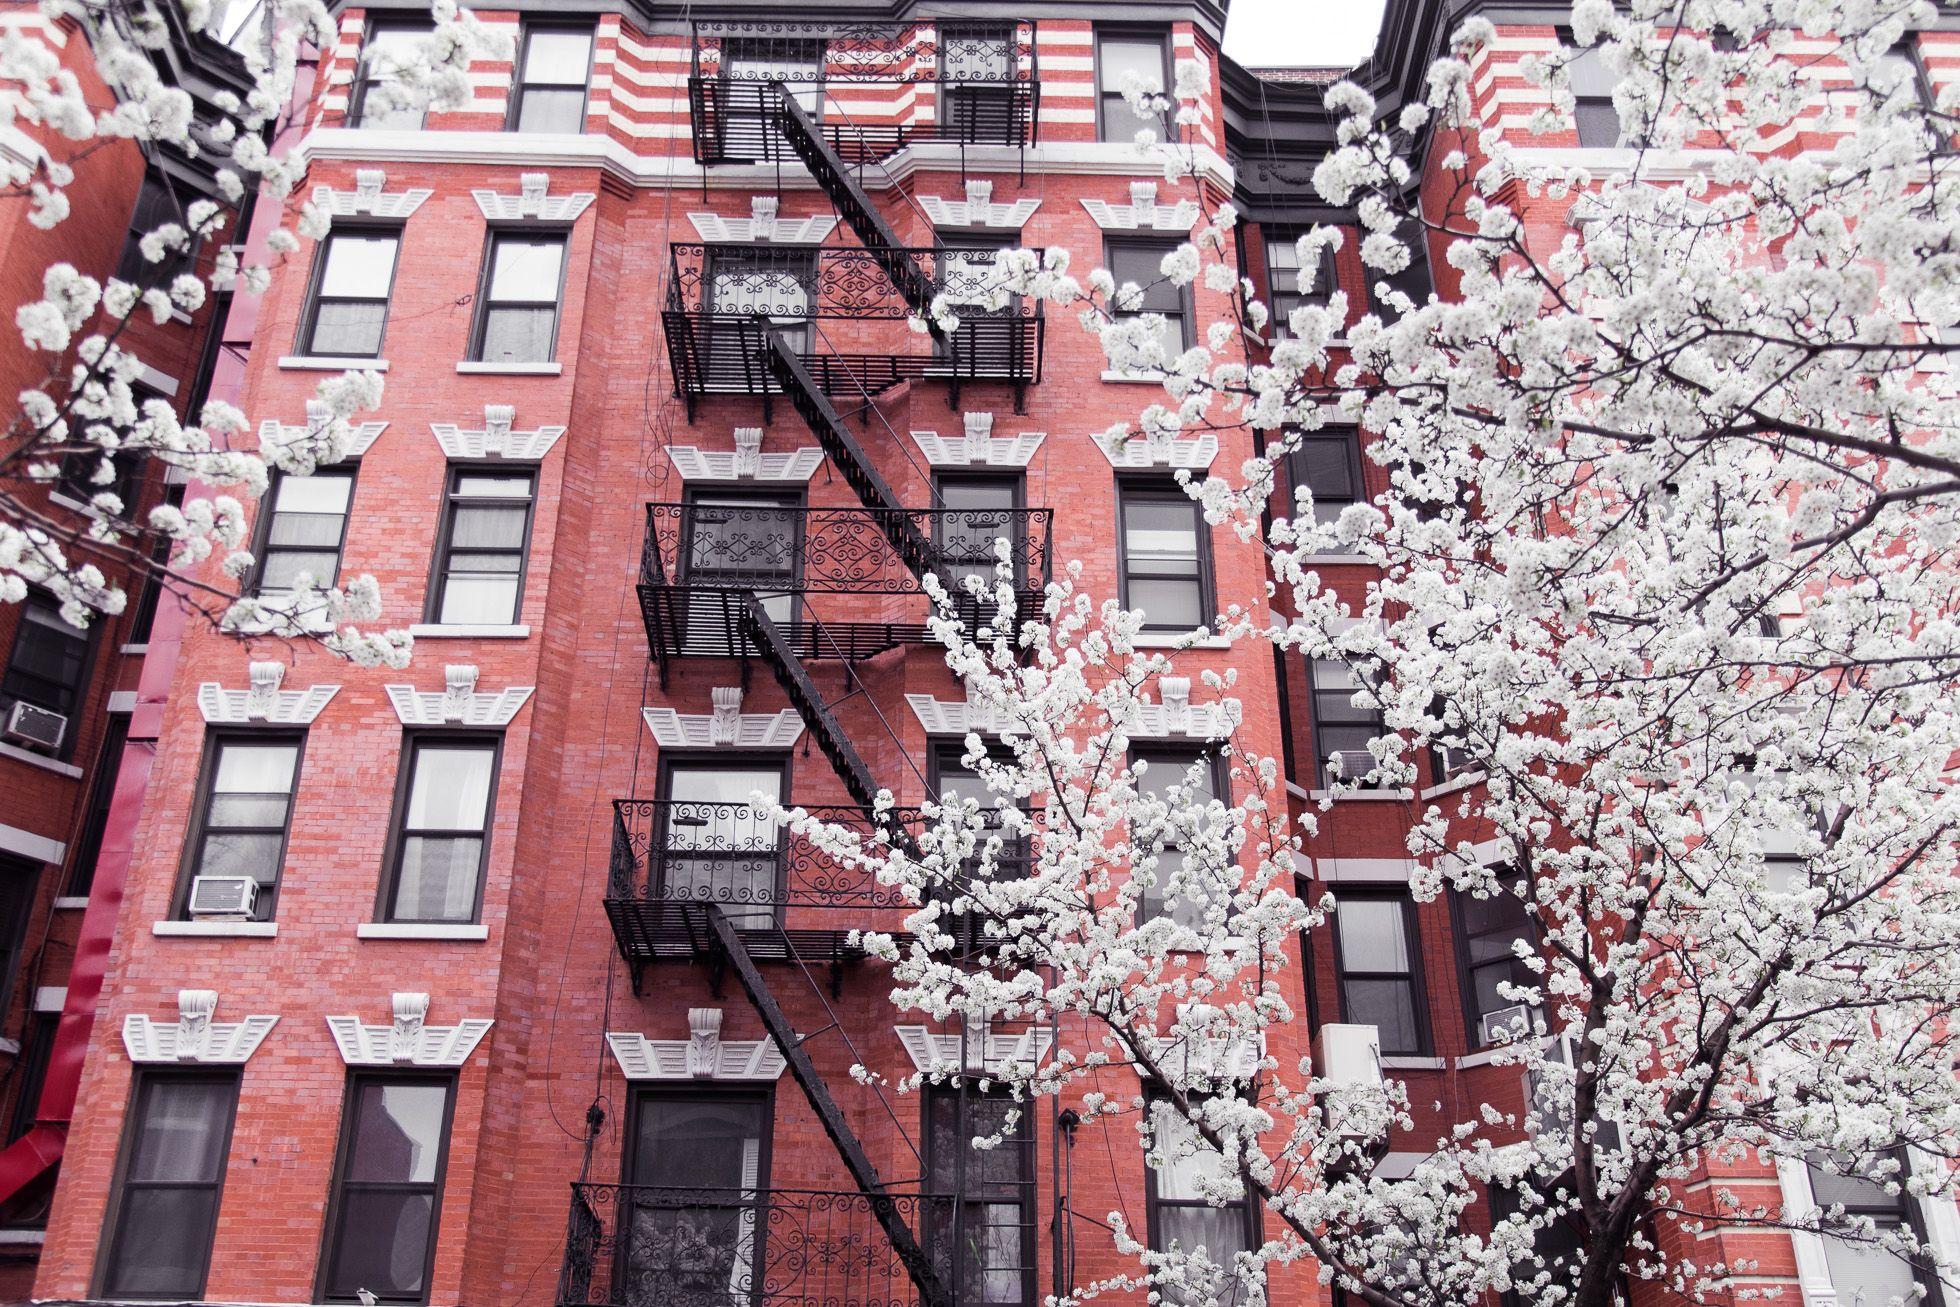 Lisa-Olsson-New-York-Moments-6